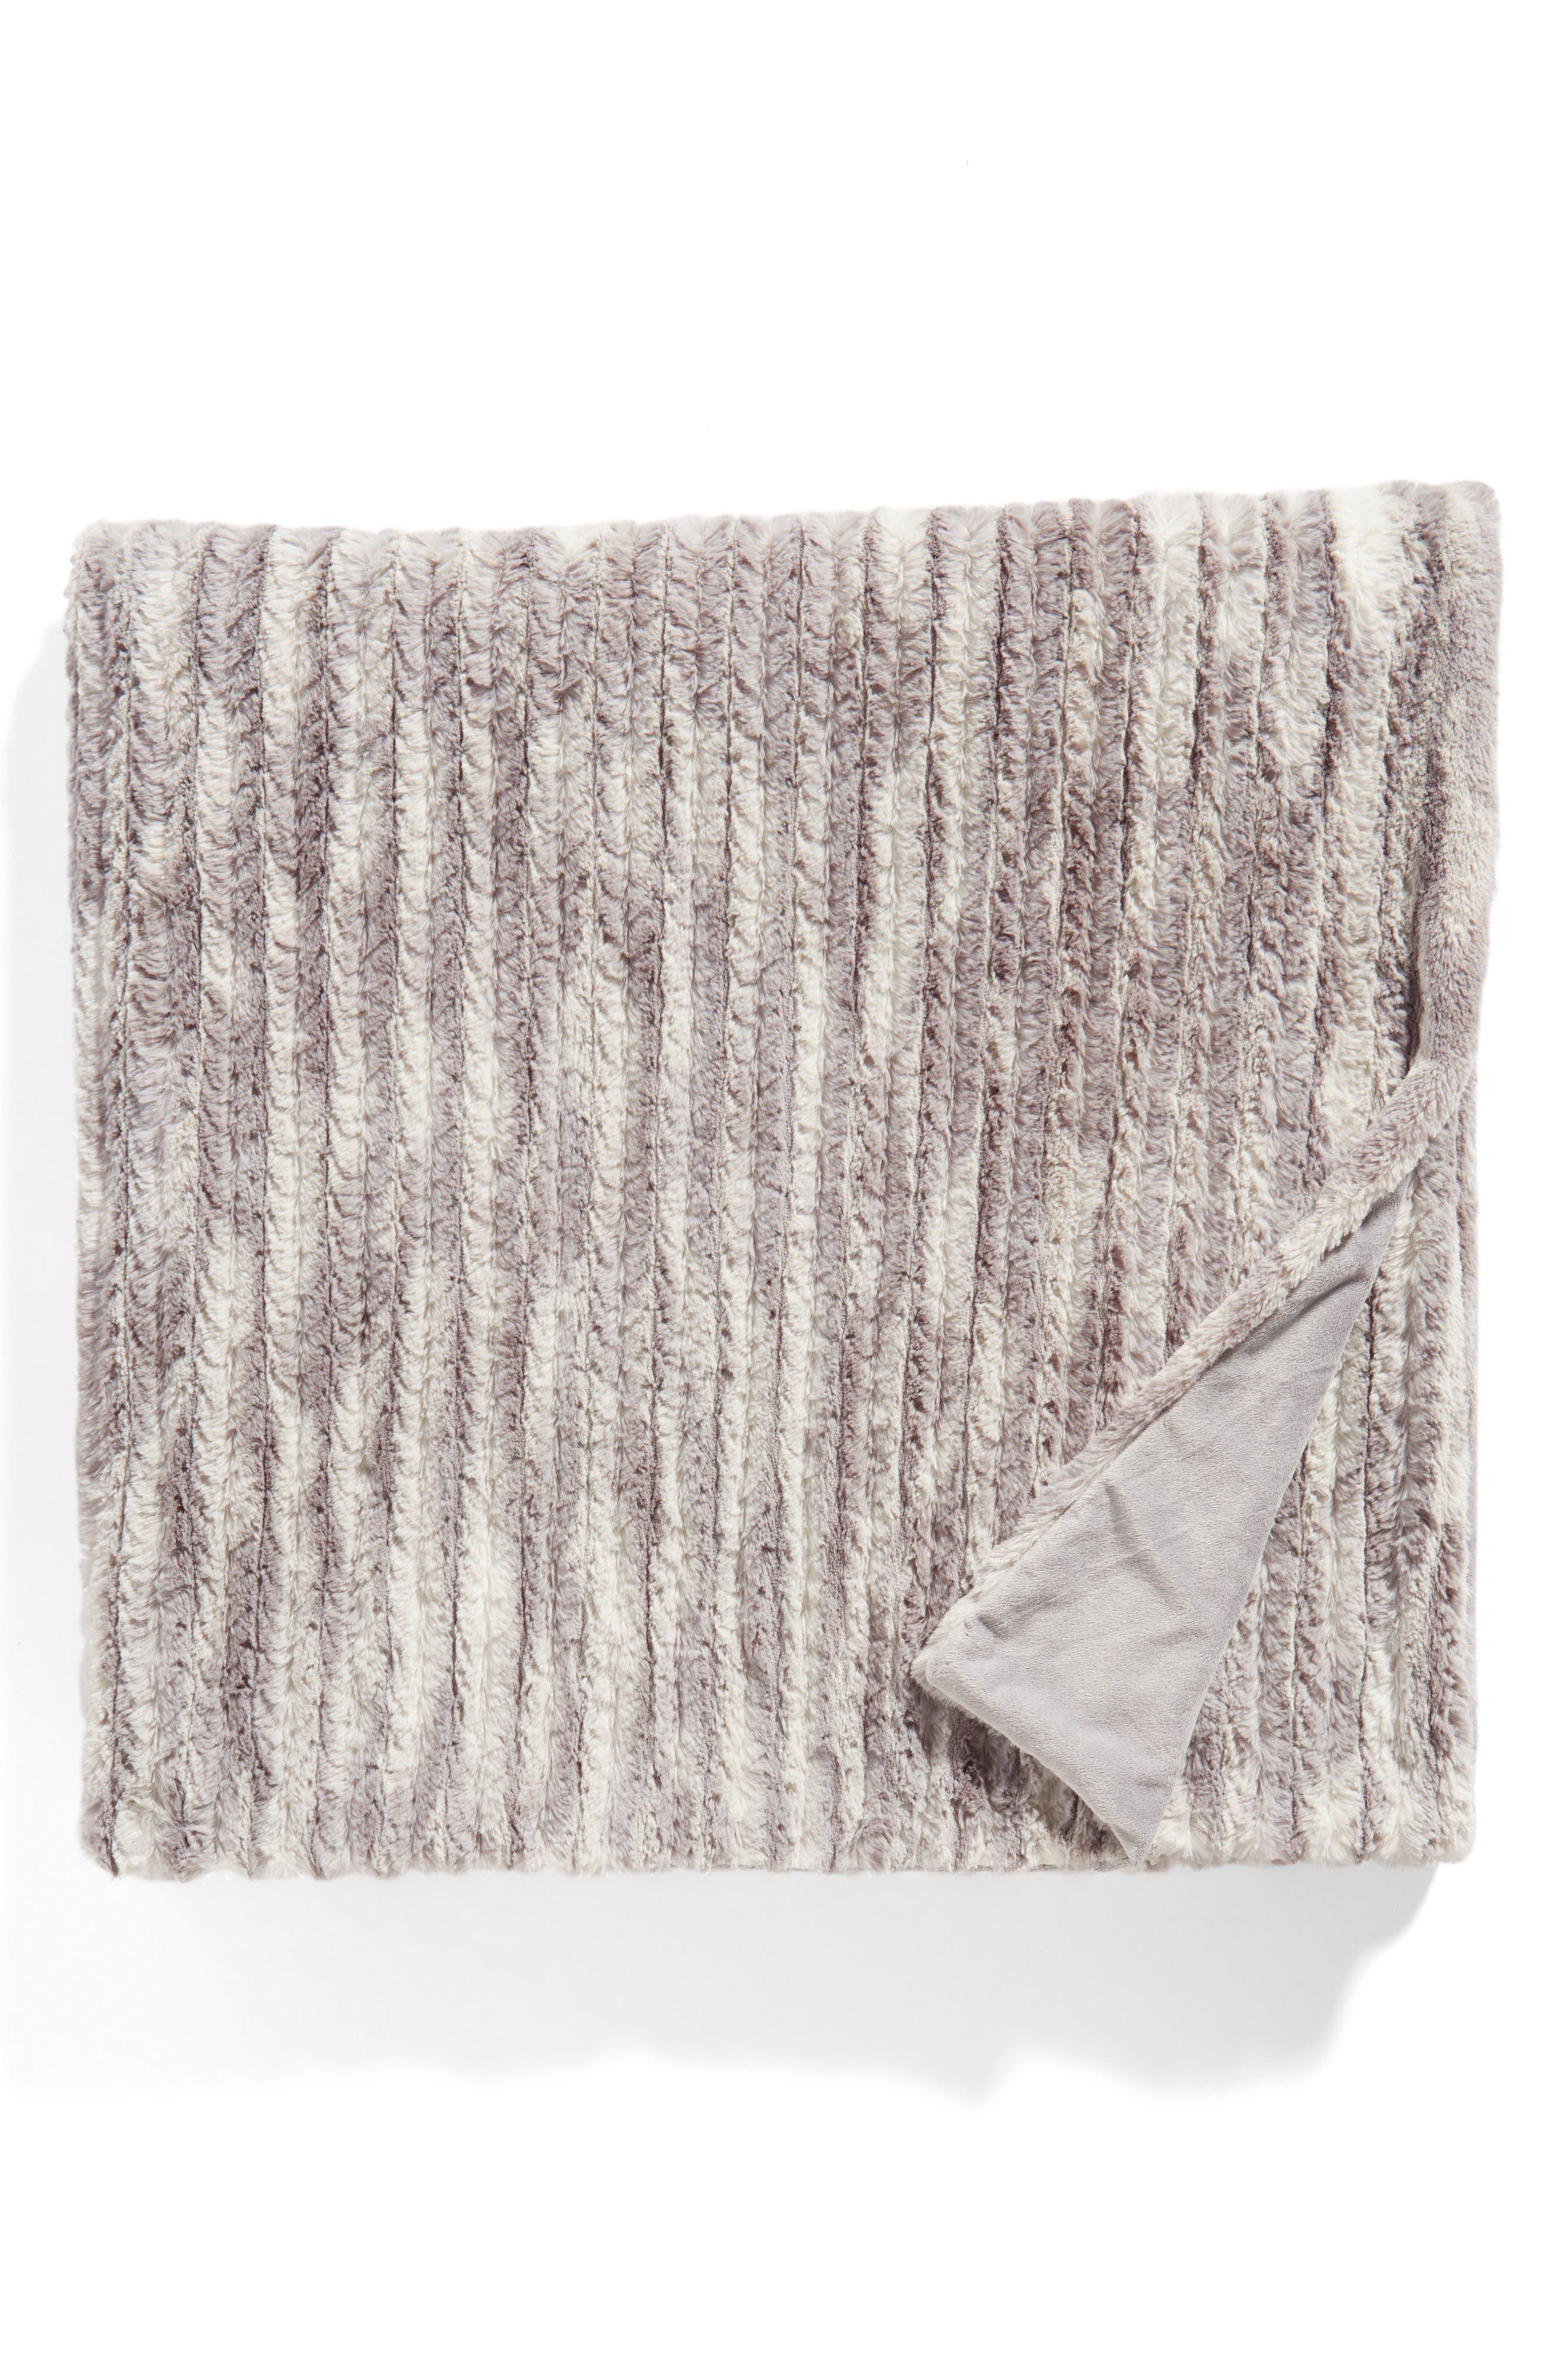 Nordstrom Cozy Plush Faux Fur Blanket,                         Main,                         color, Grey Excalibur Print